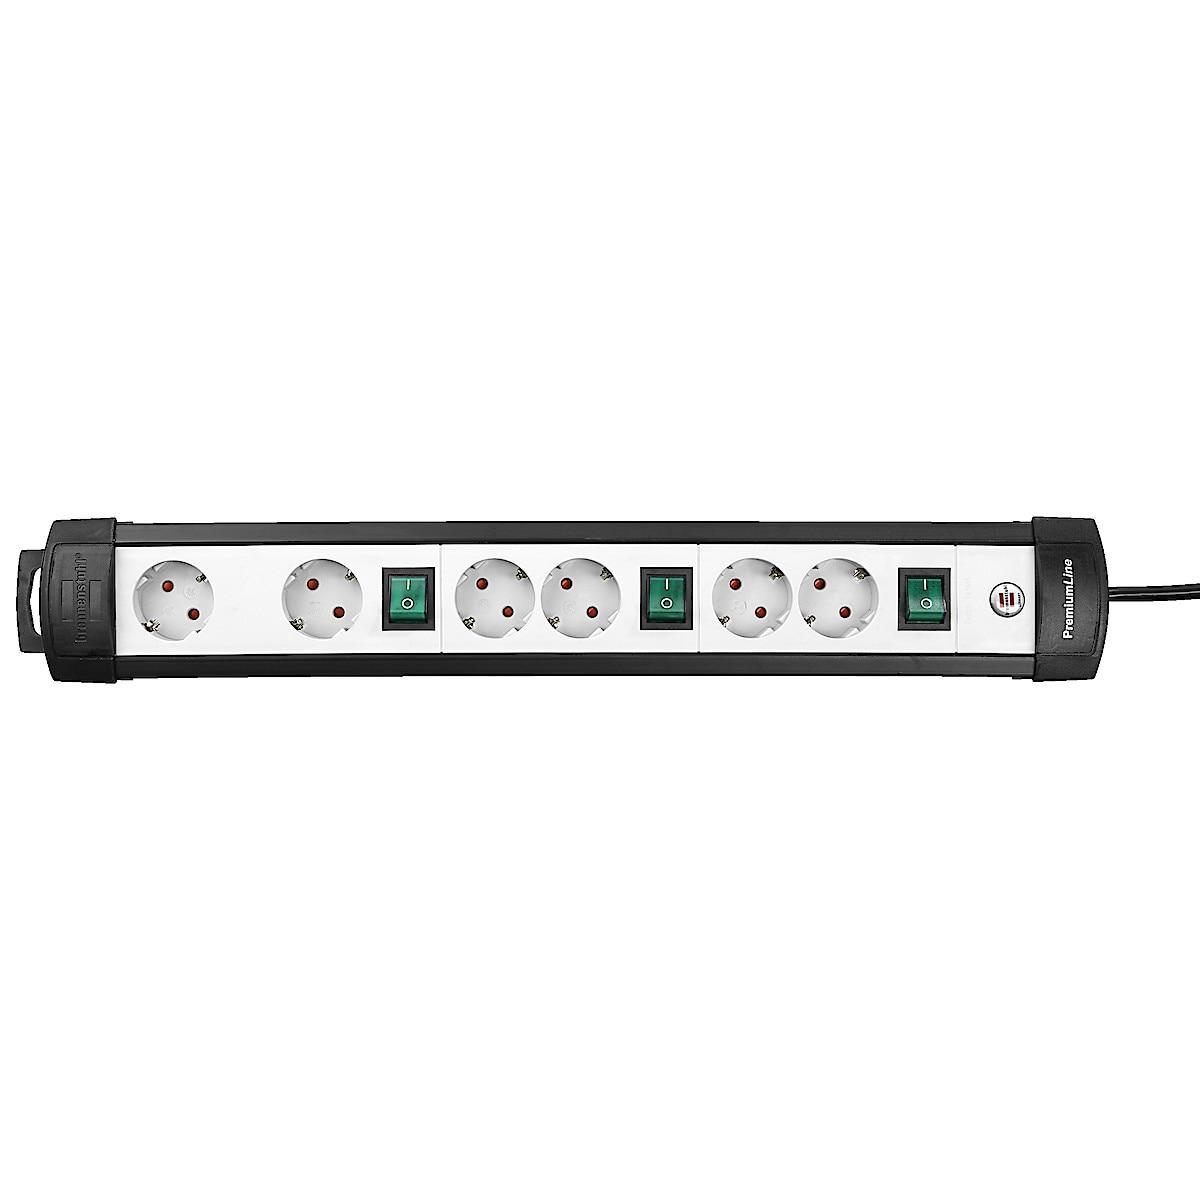 Jatkojohto Brennenstuhl Premium-Line Technics